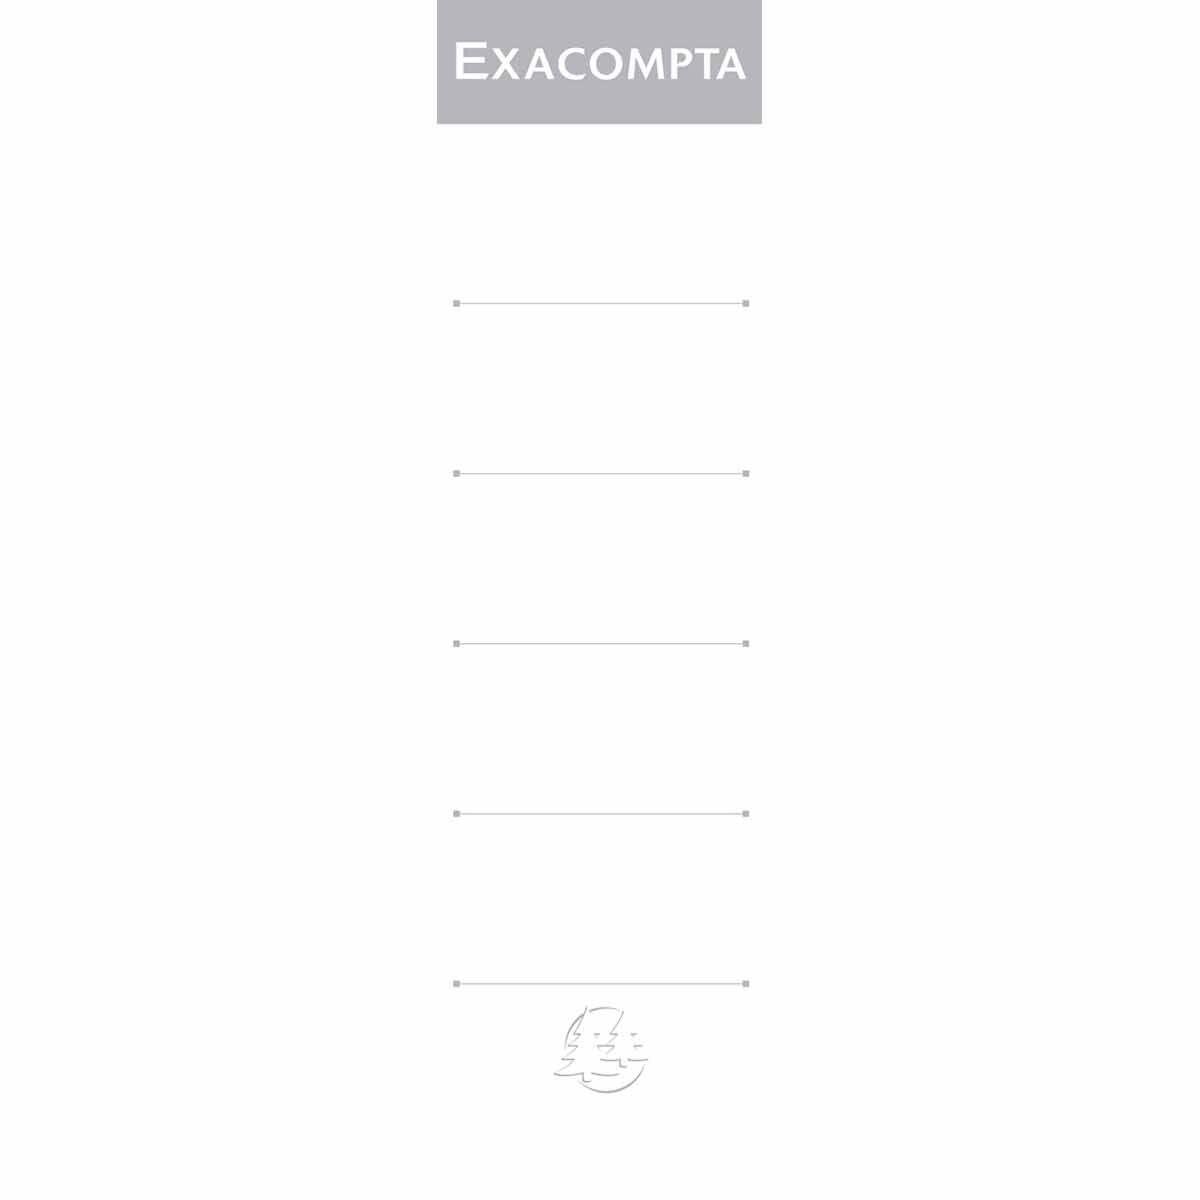 Exacompta Lever Arch File Spine 70mm Labels Pack of 10